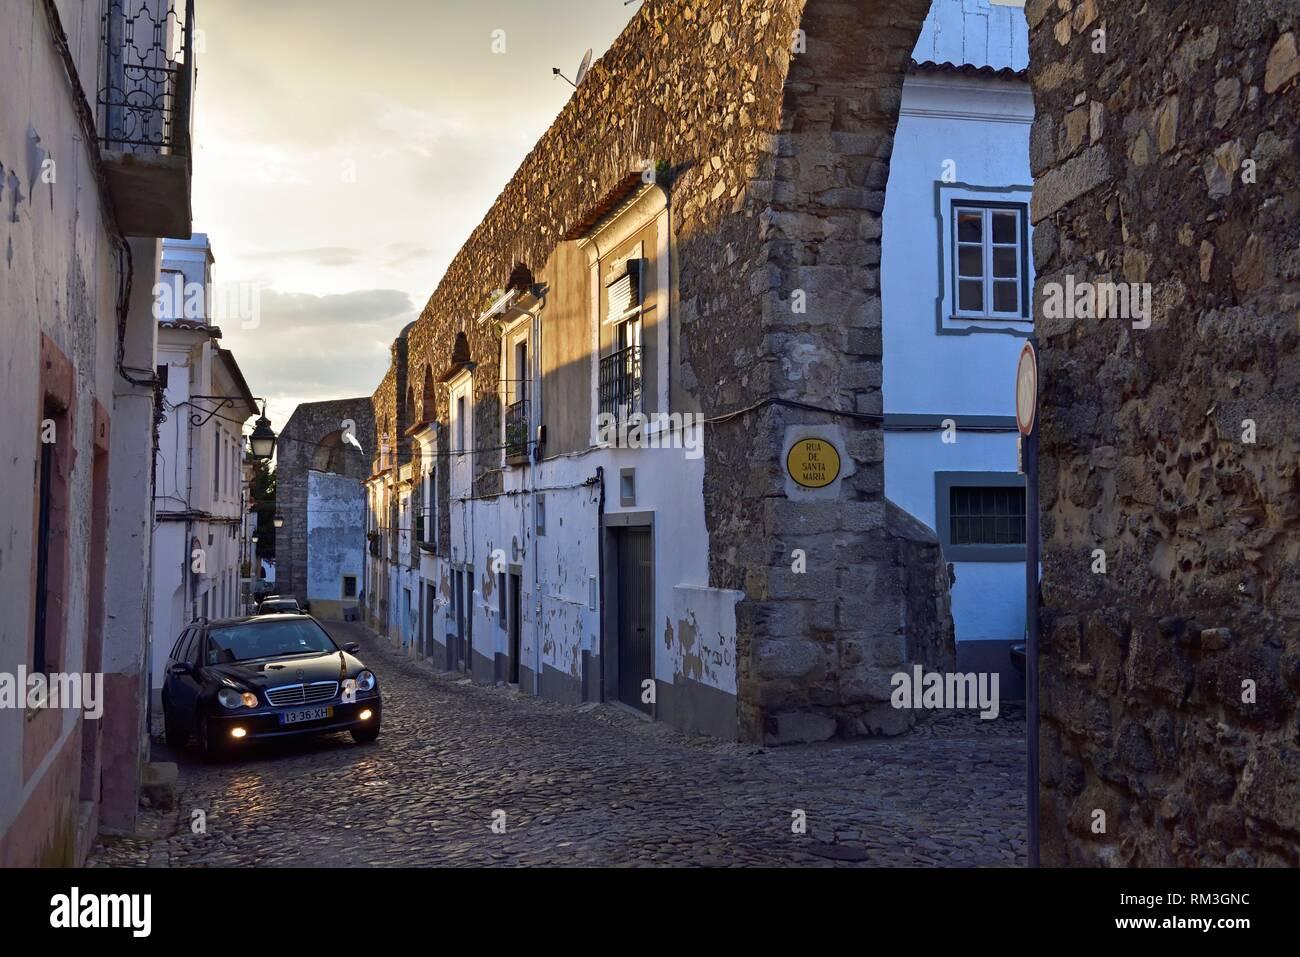 houses built between the arches of the Prata Aqueduct, Rua do Cano, Evora, Alentejo region, Portugal, southwertern Europe. - Stock Image